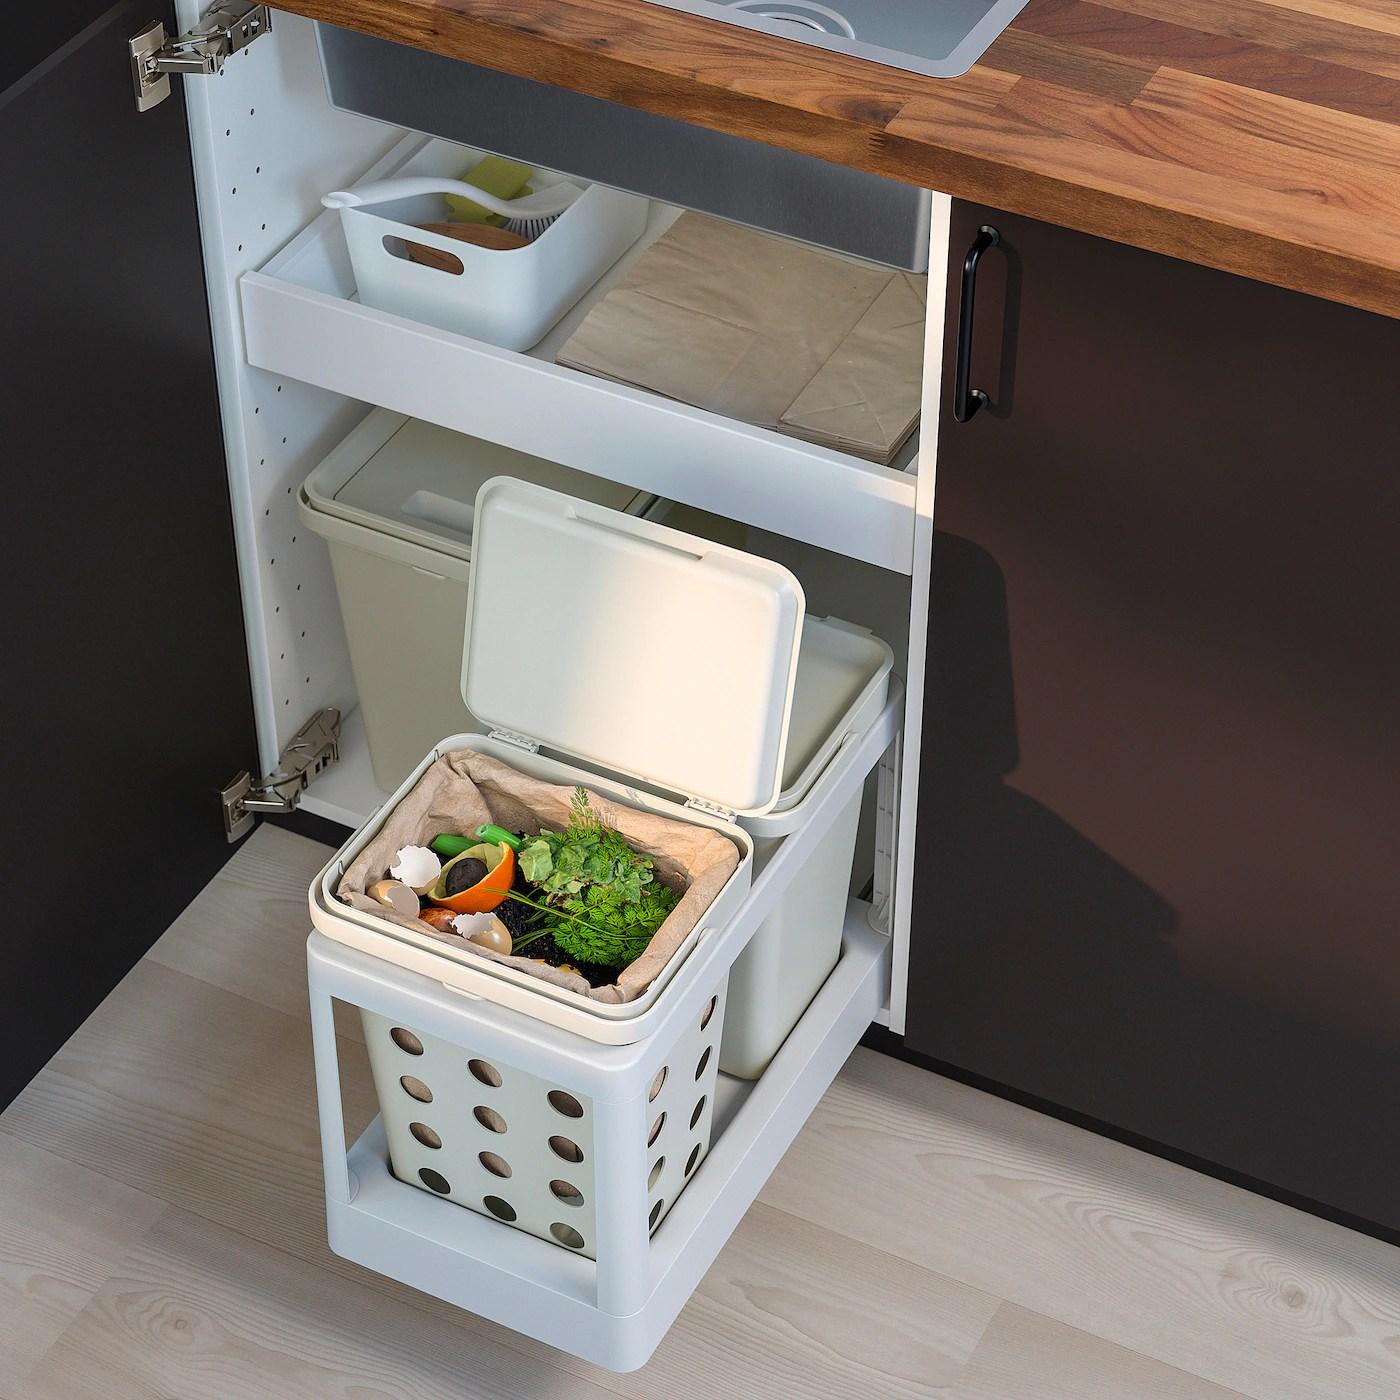 Di smart mamma su pinterest. Accessori Interni Per Mobili Da Cucina It Ikea It